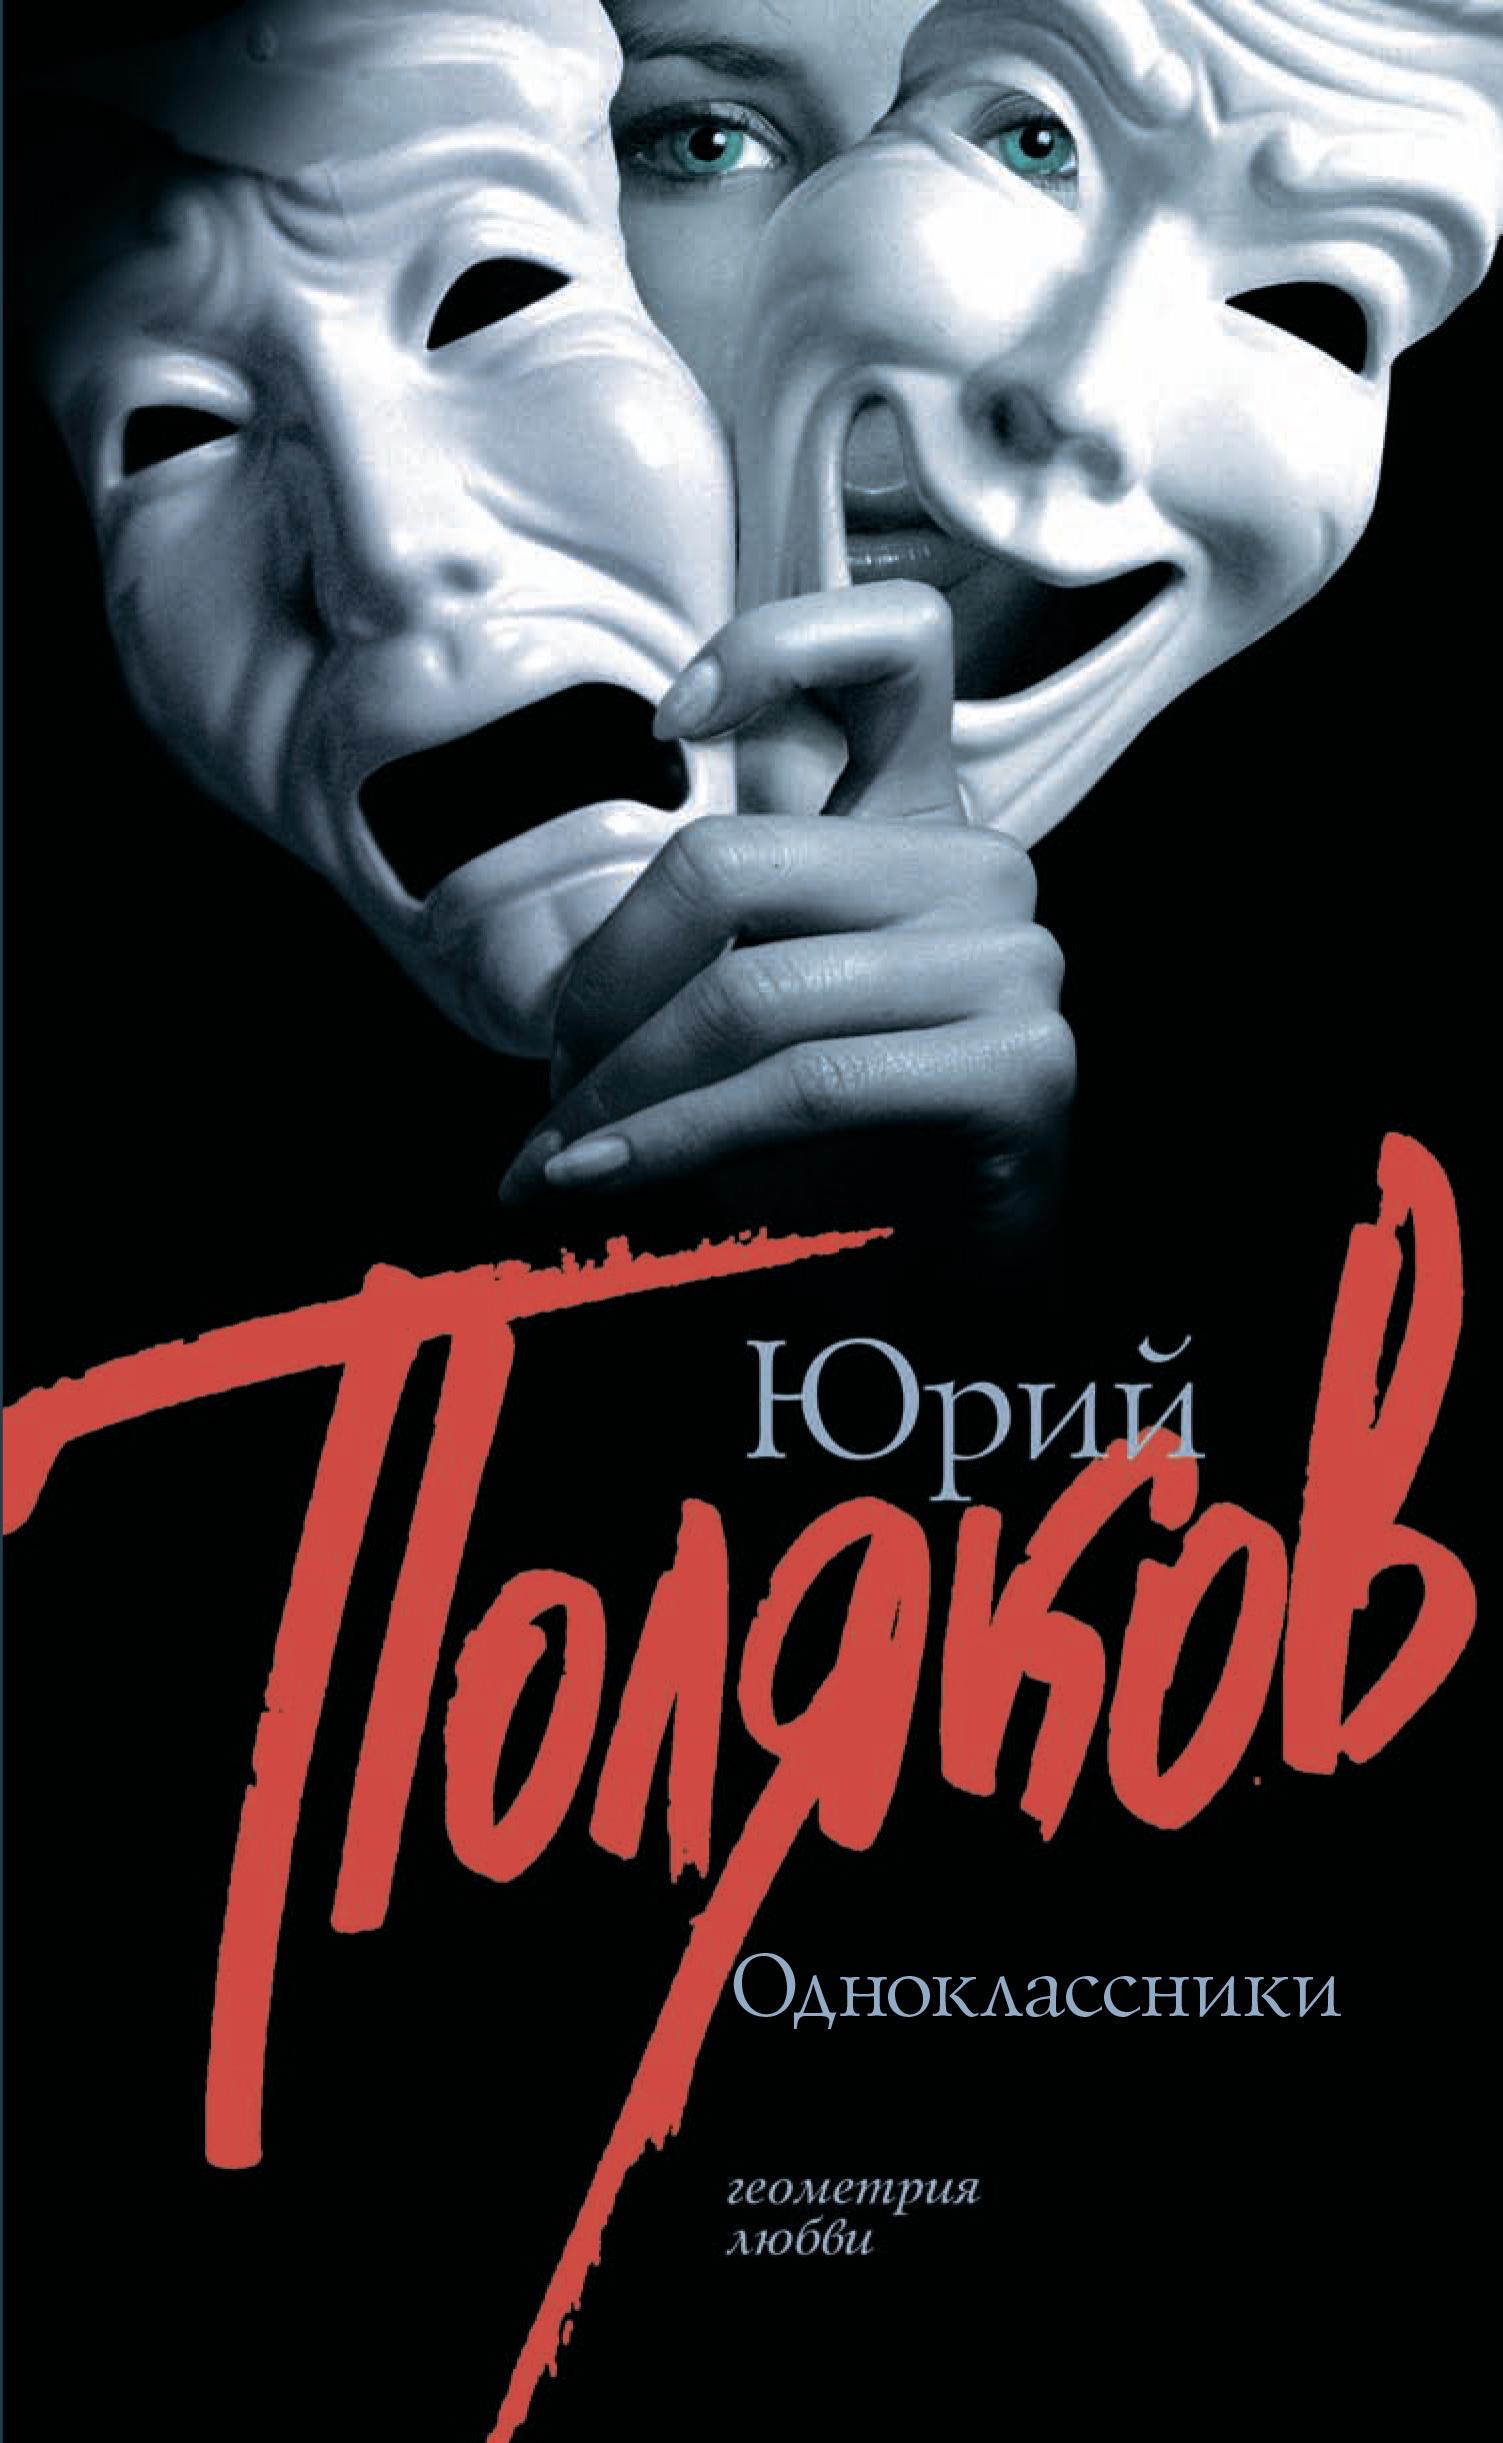 Юрий Поляков Одноклассники (сборник)